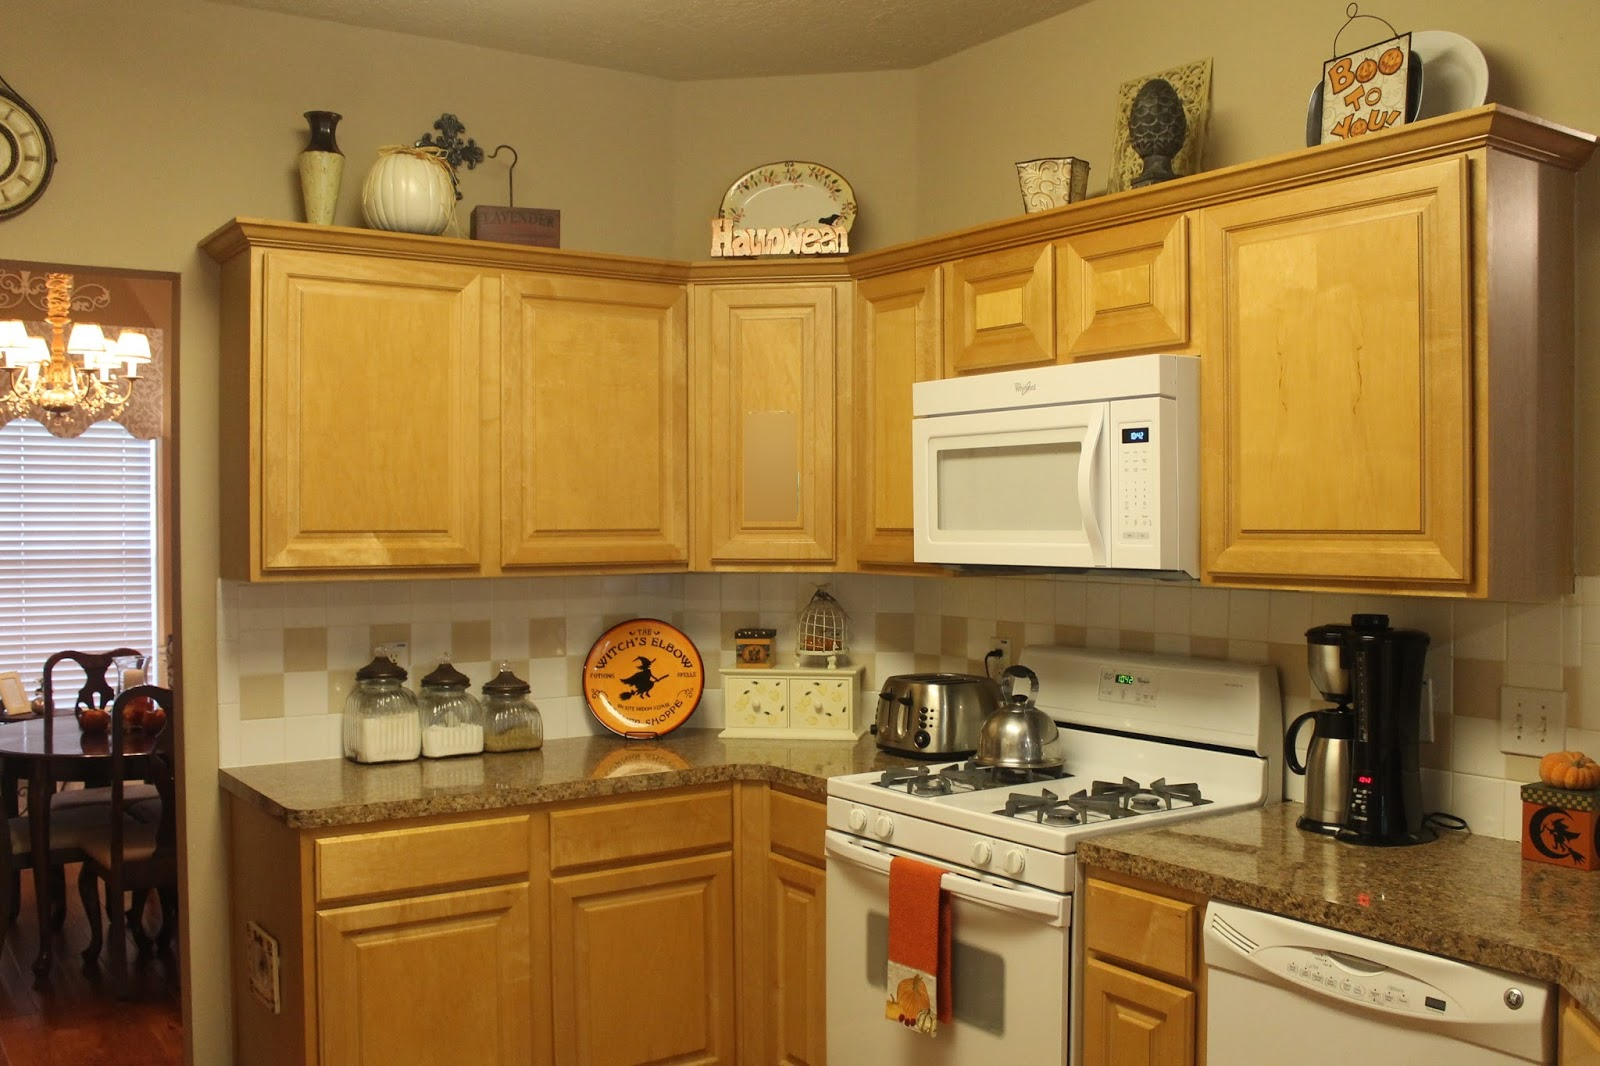 Http Texasdecor Blogspot Com 2013 10 Fall Decor Part 3 Kitchen Html